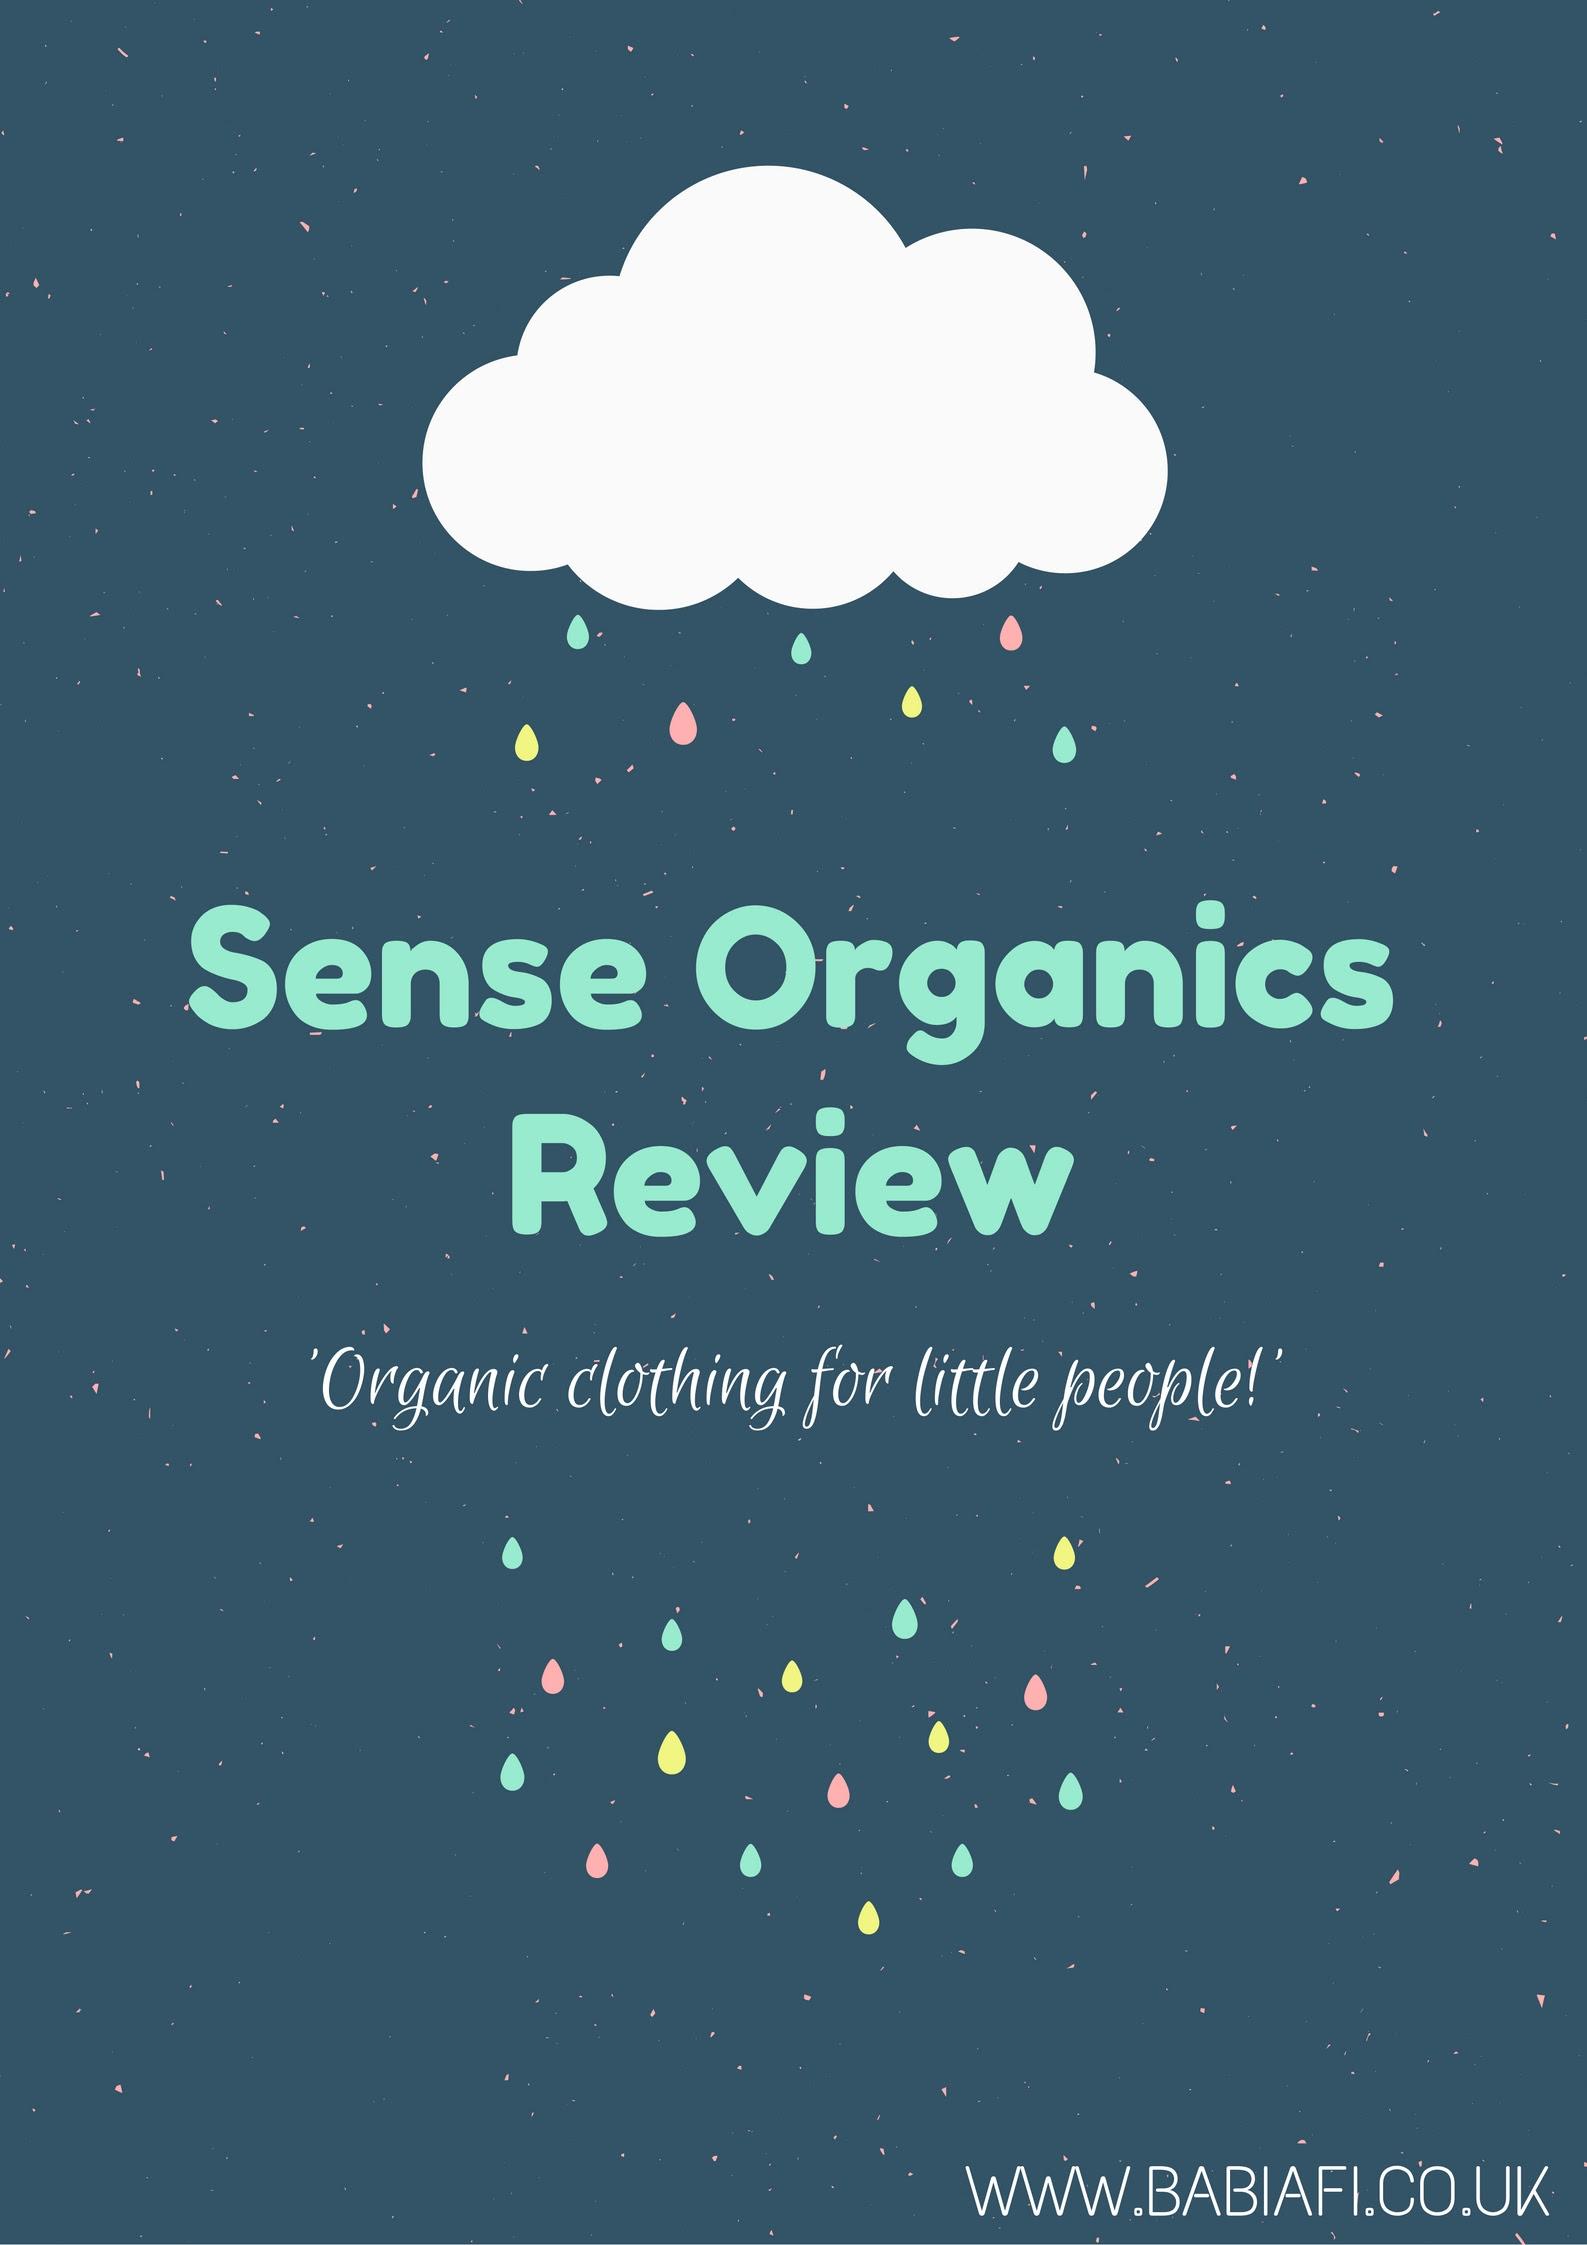 Sense Organics Review